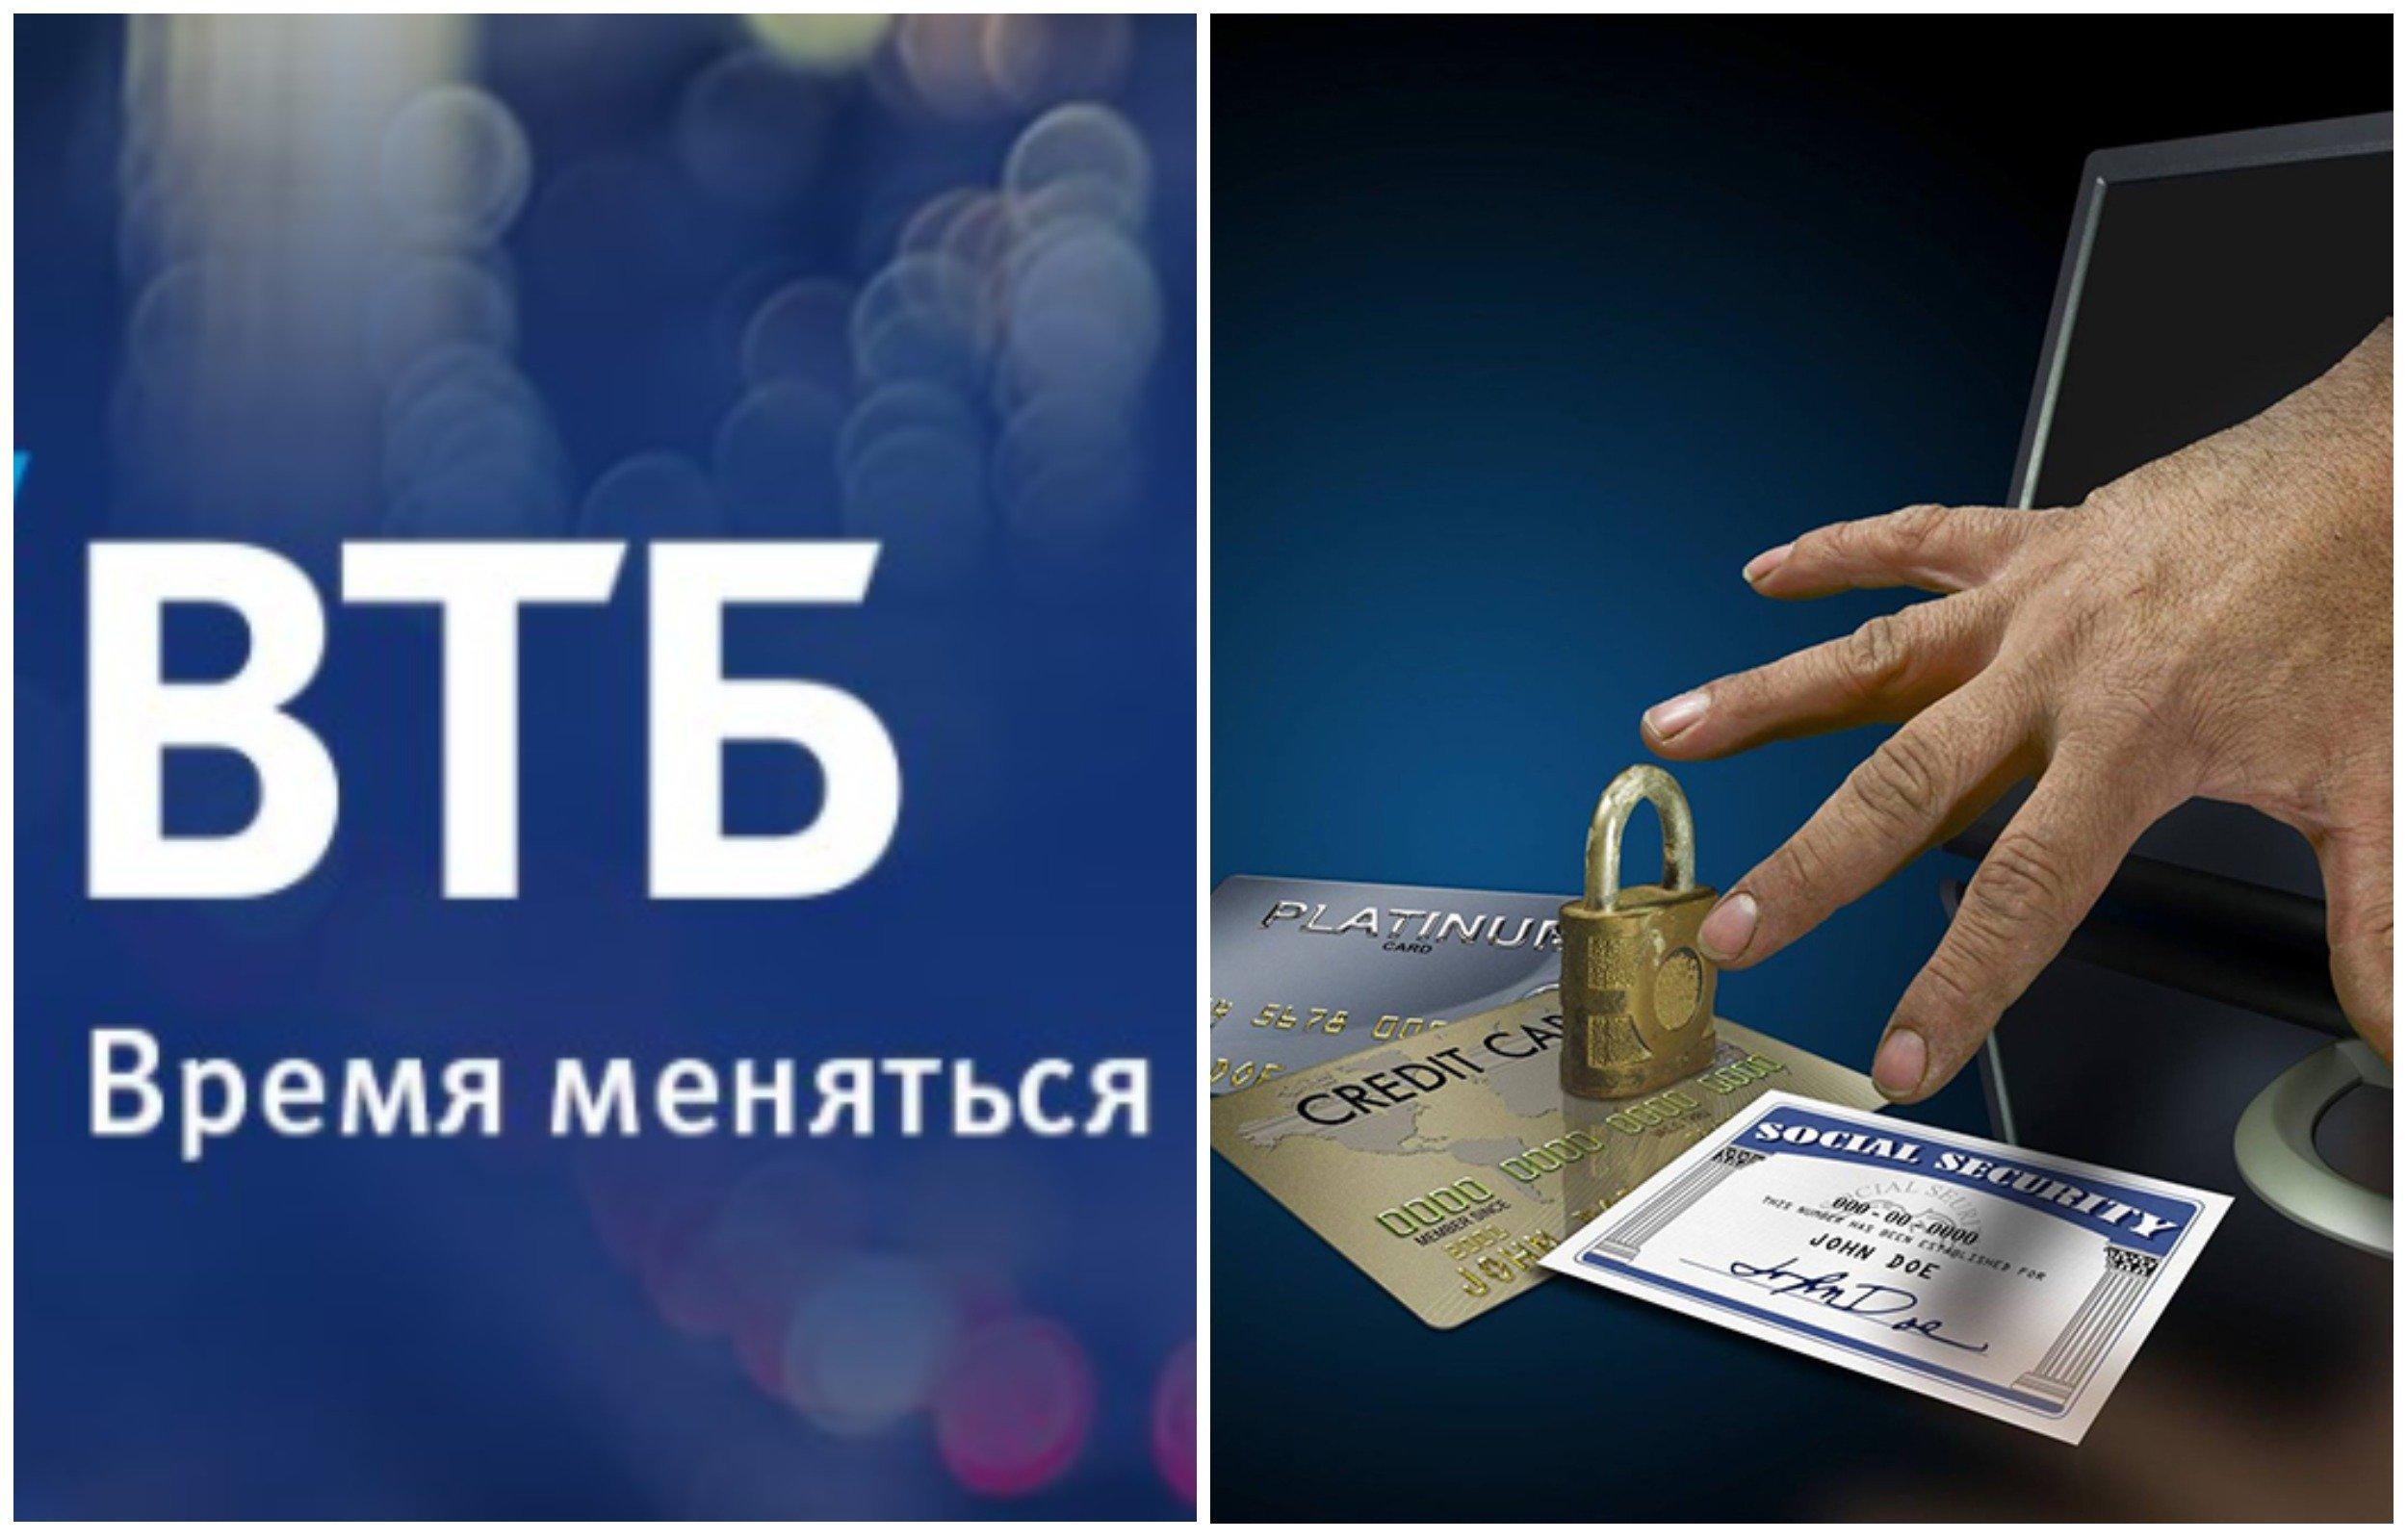 втб банк оформить заявку на ипотеку